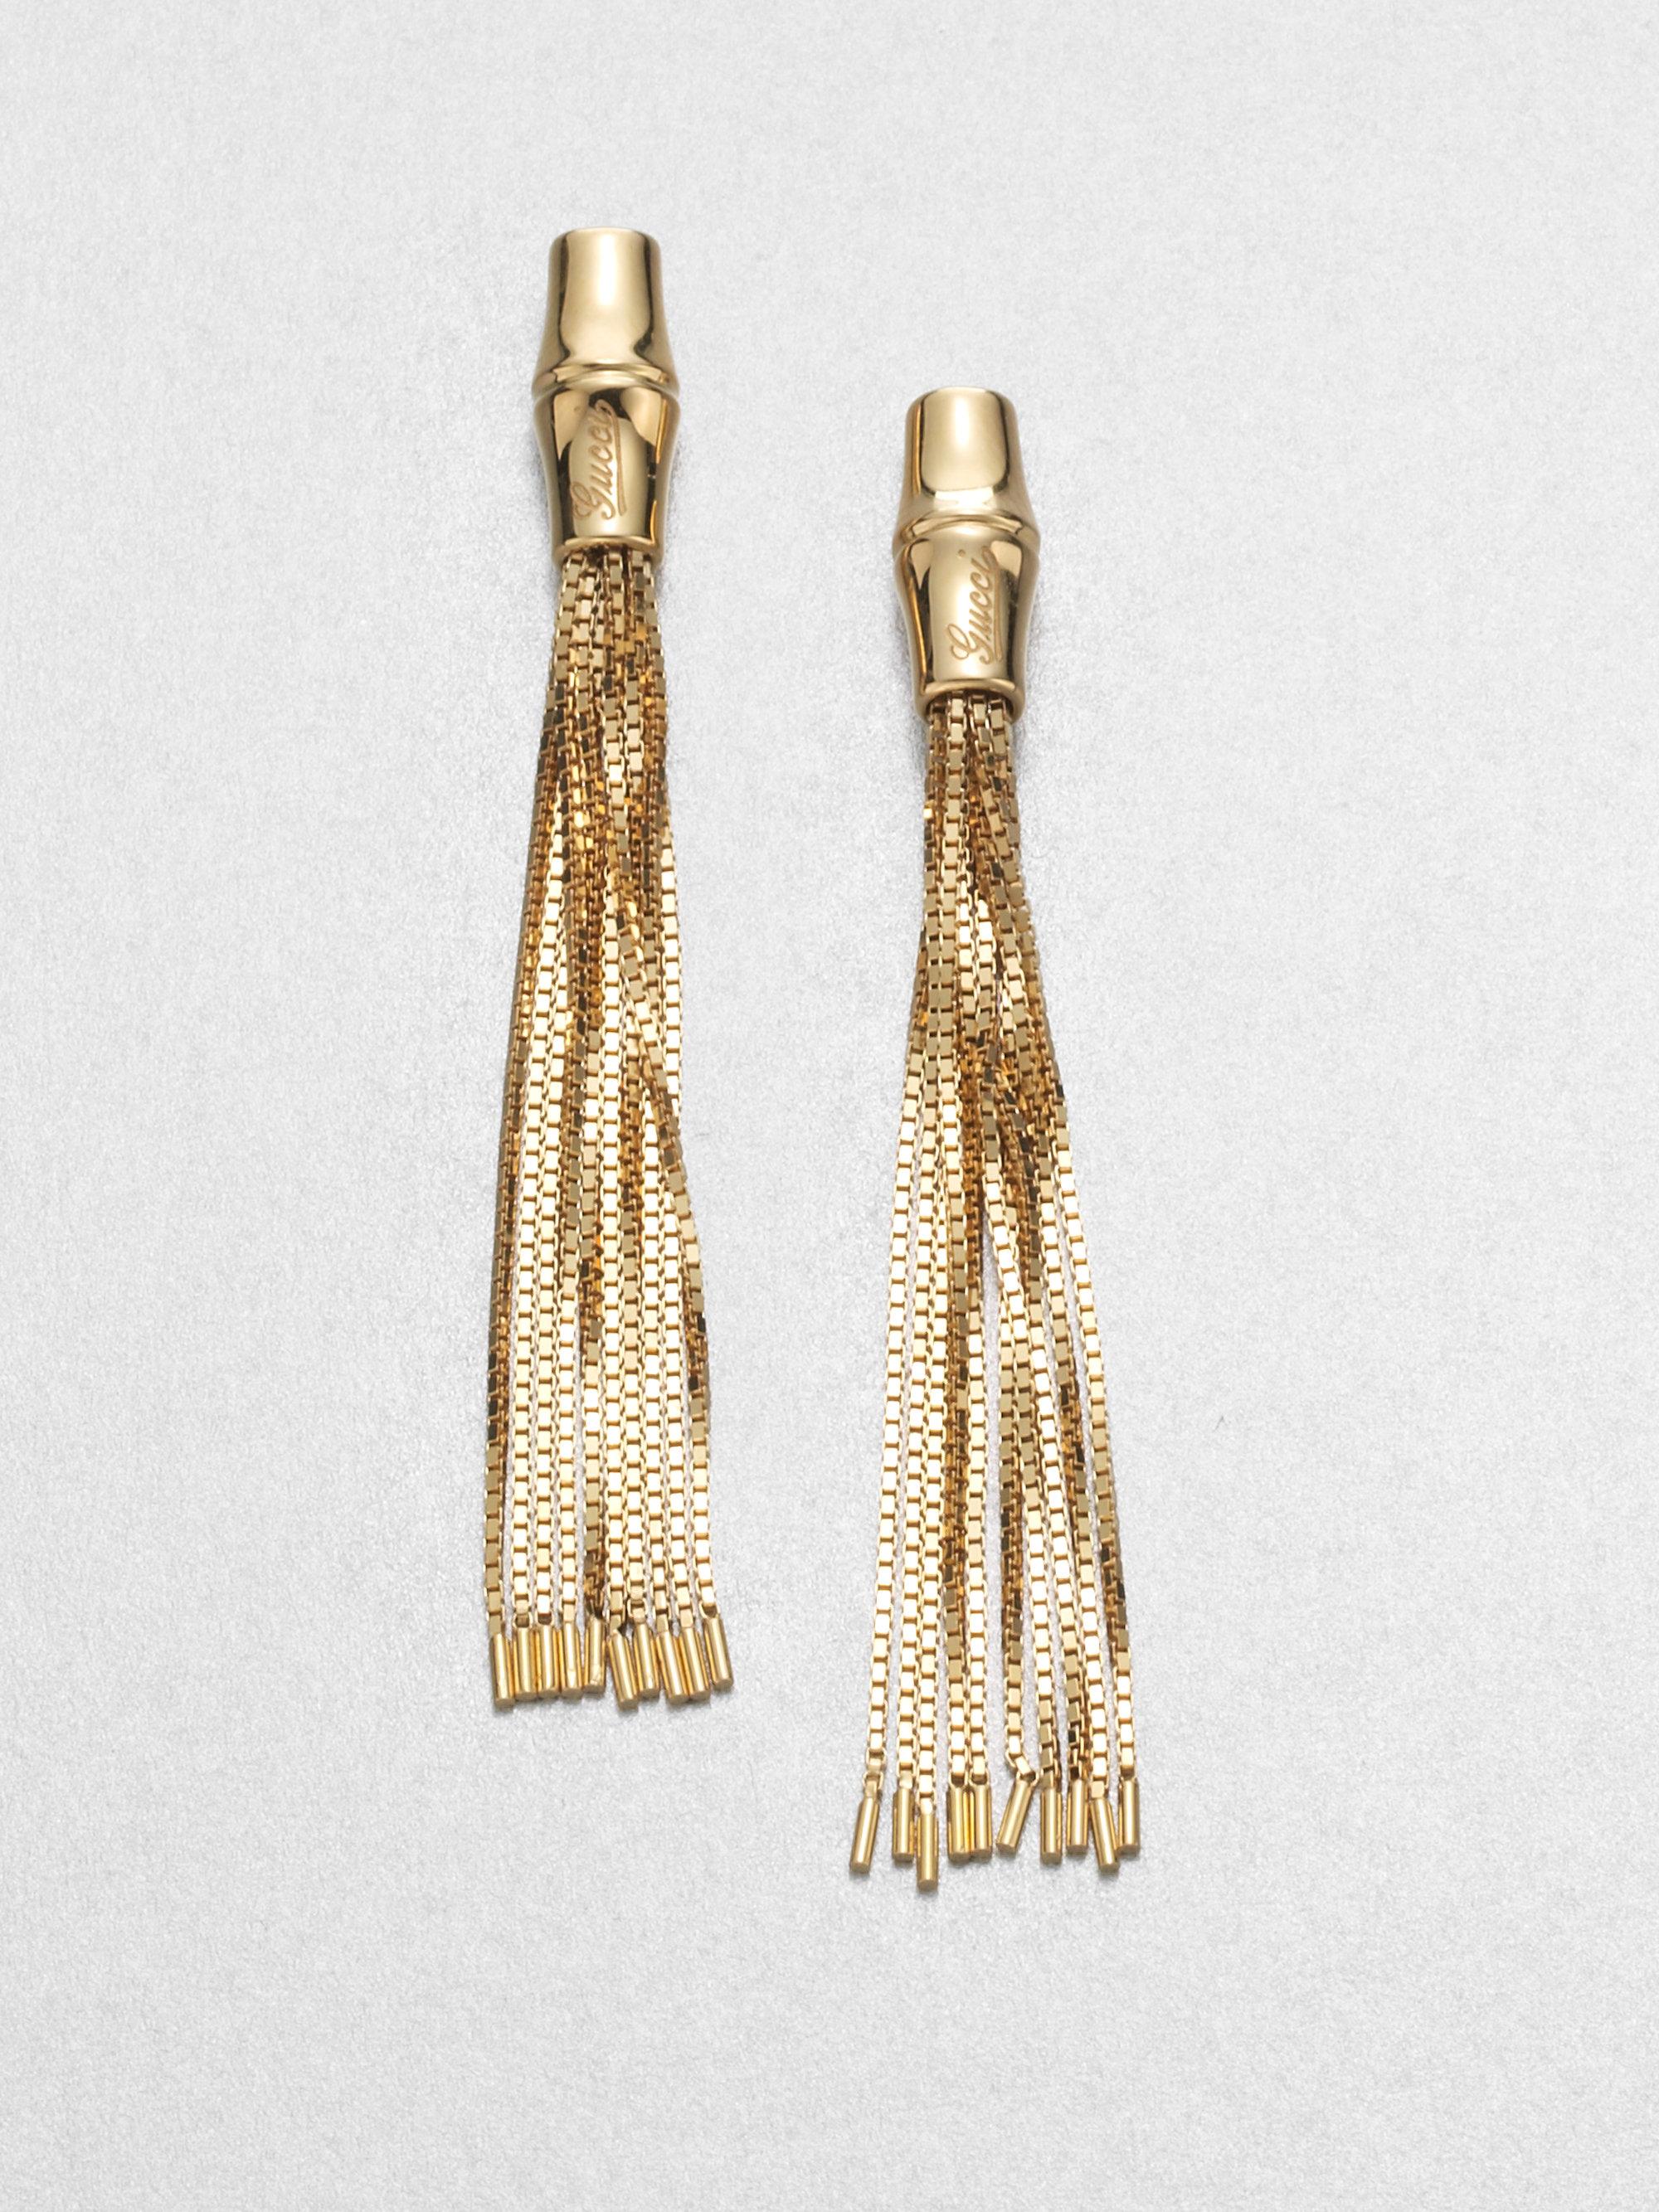 86d090acc Gucci Bamboo 18k Yellow Gold Tassel Earrings in Metallic - Lyst